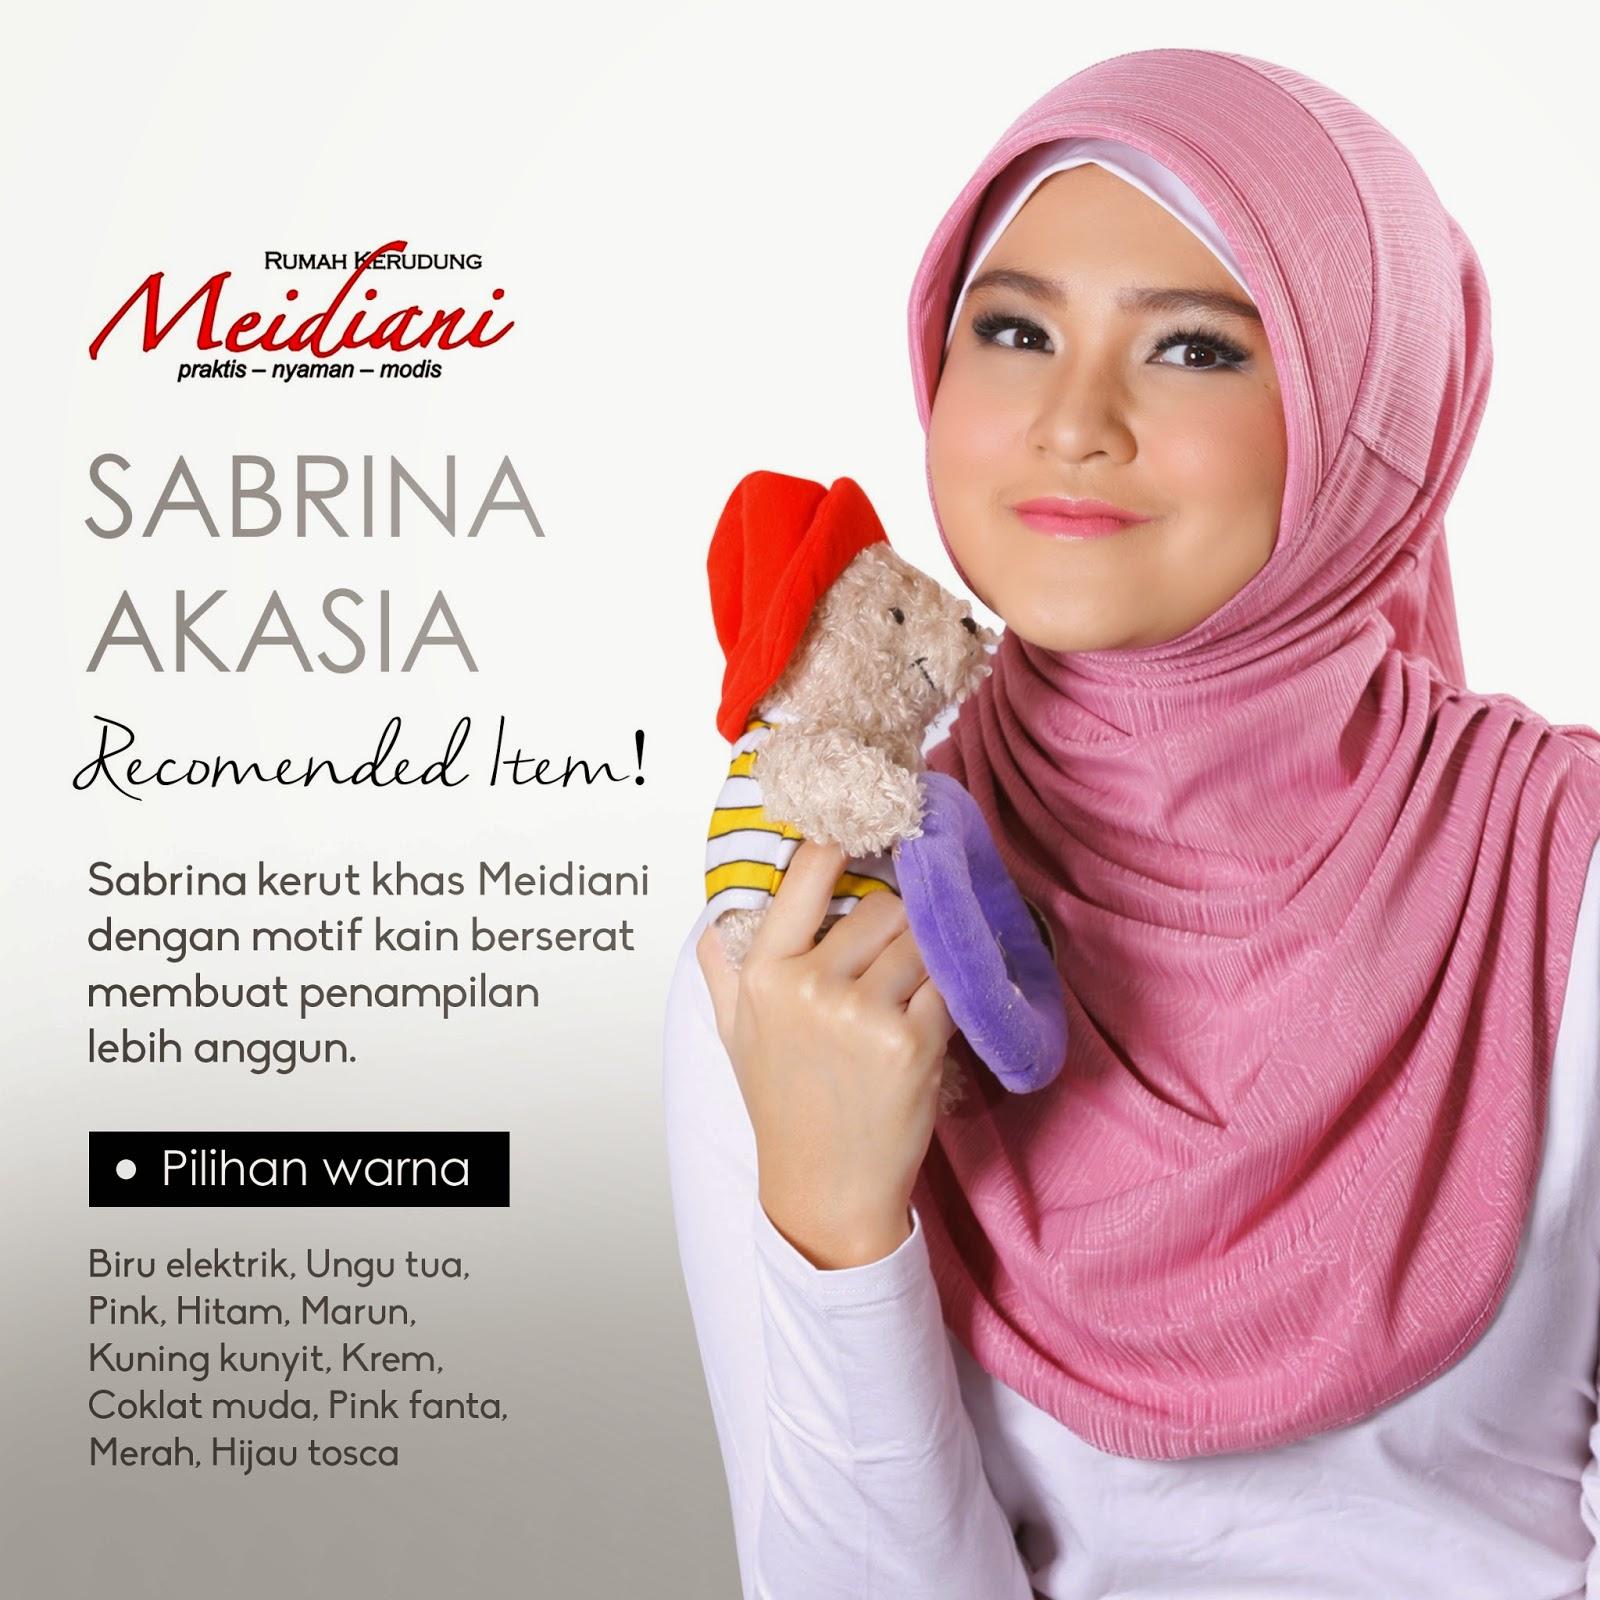 Sabrina Akasia